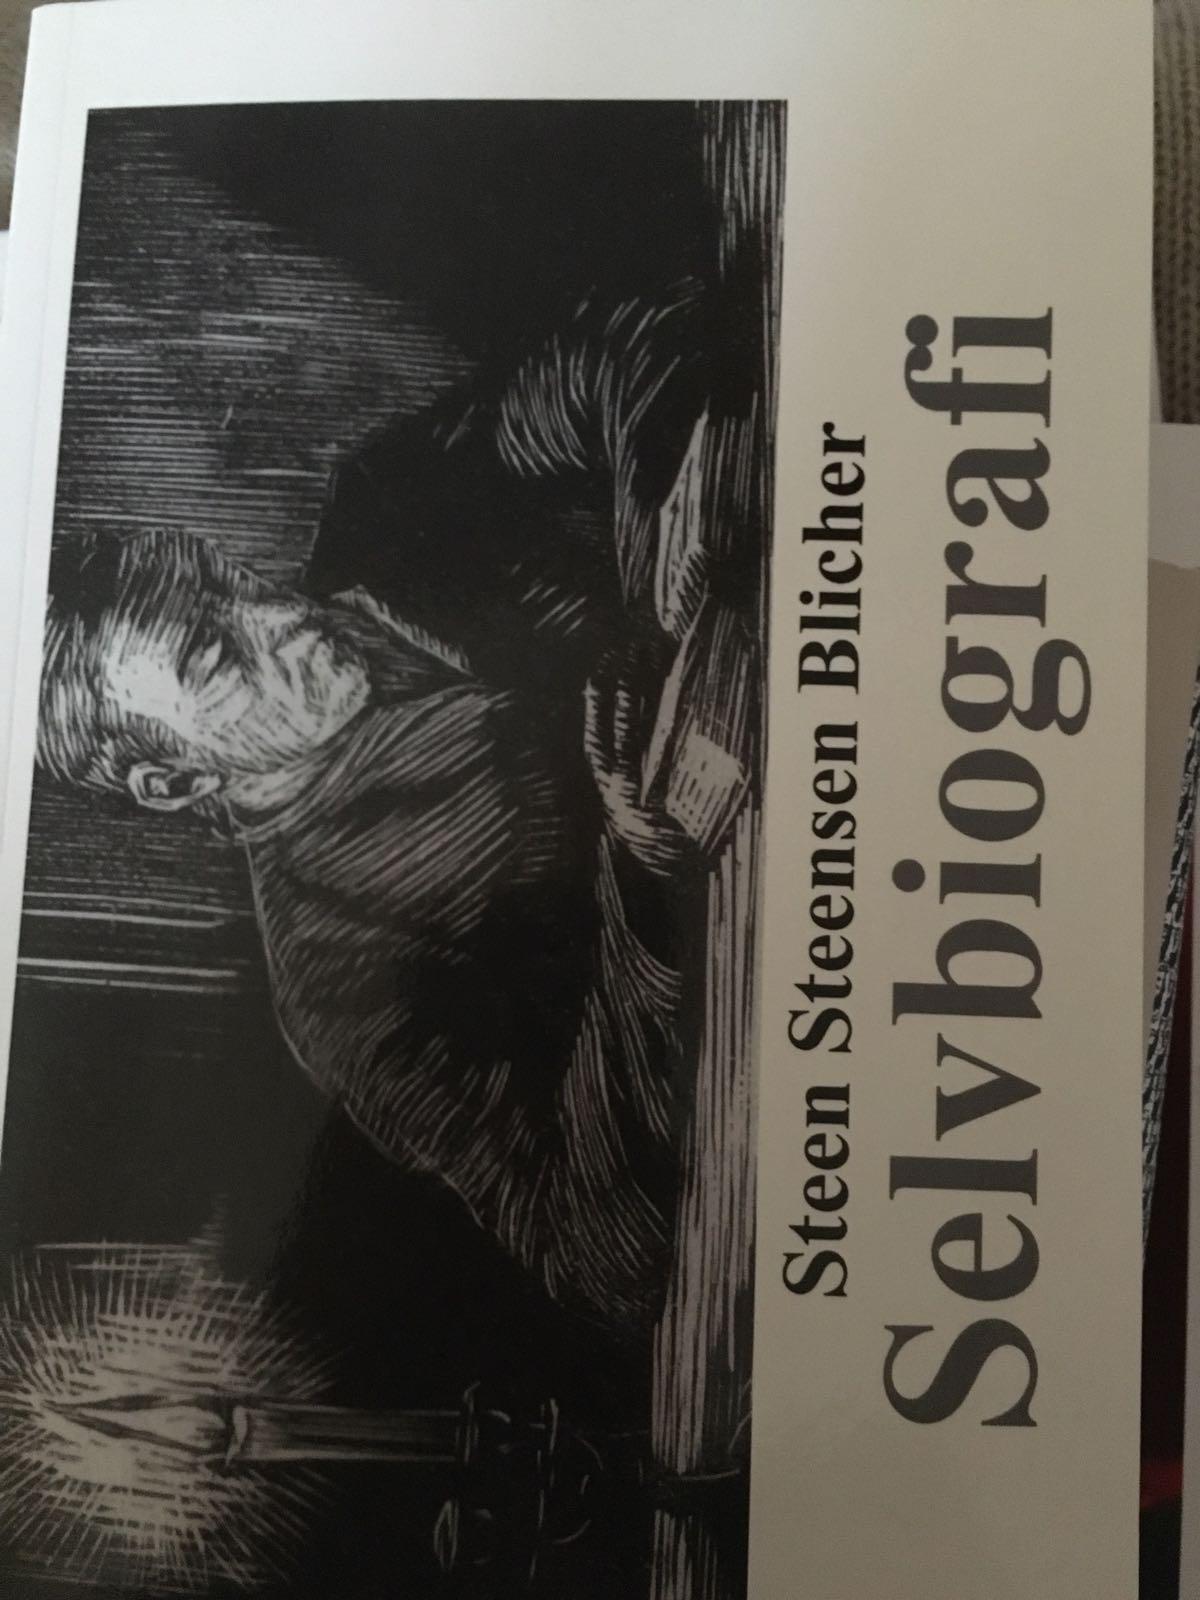 Selvbiografi af Steen Steensen Blicher